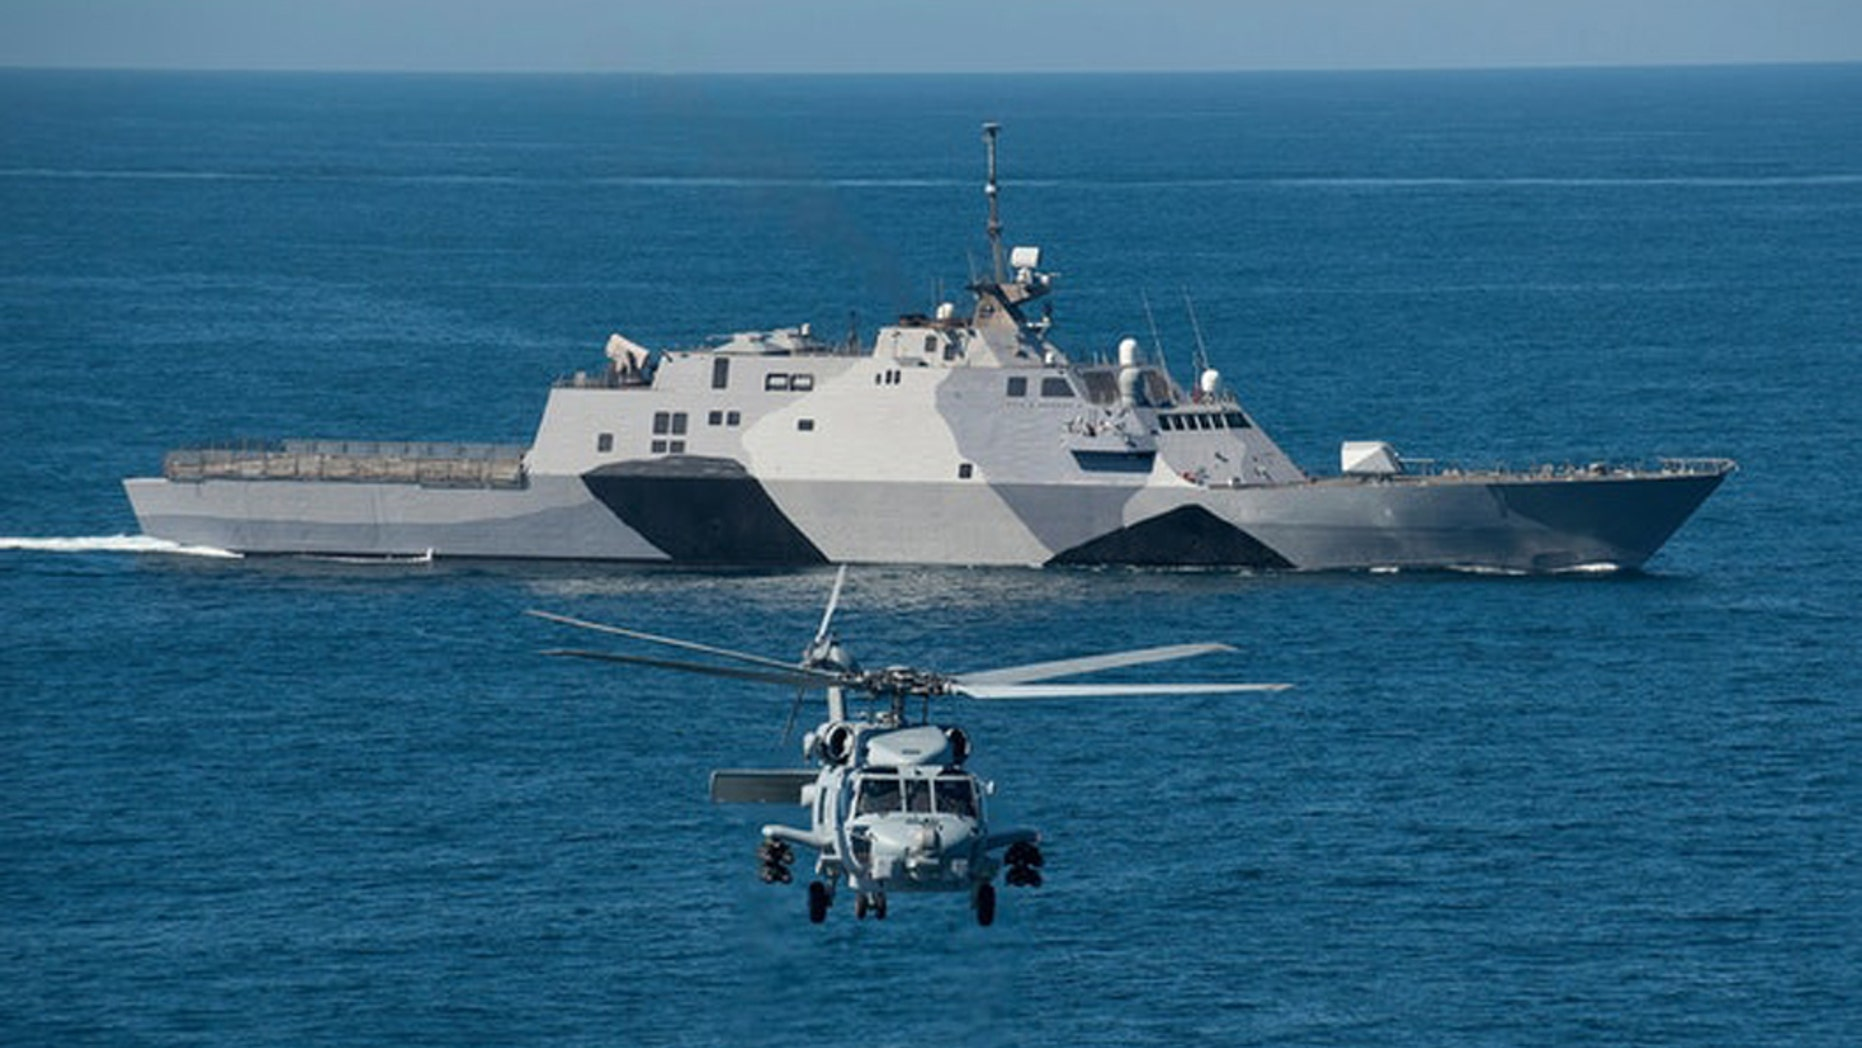 U.S. Navy photo by Mass Communication Specialist 1st Class James R. Evans (Credit: Warrior Maven)